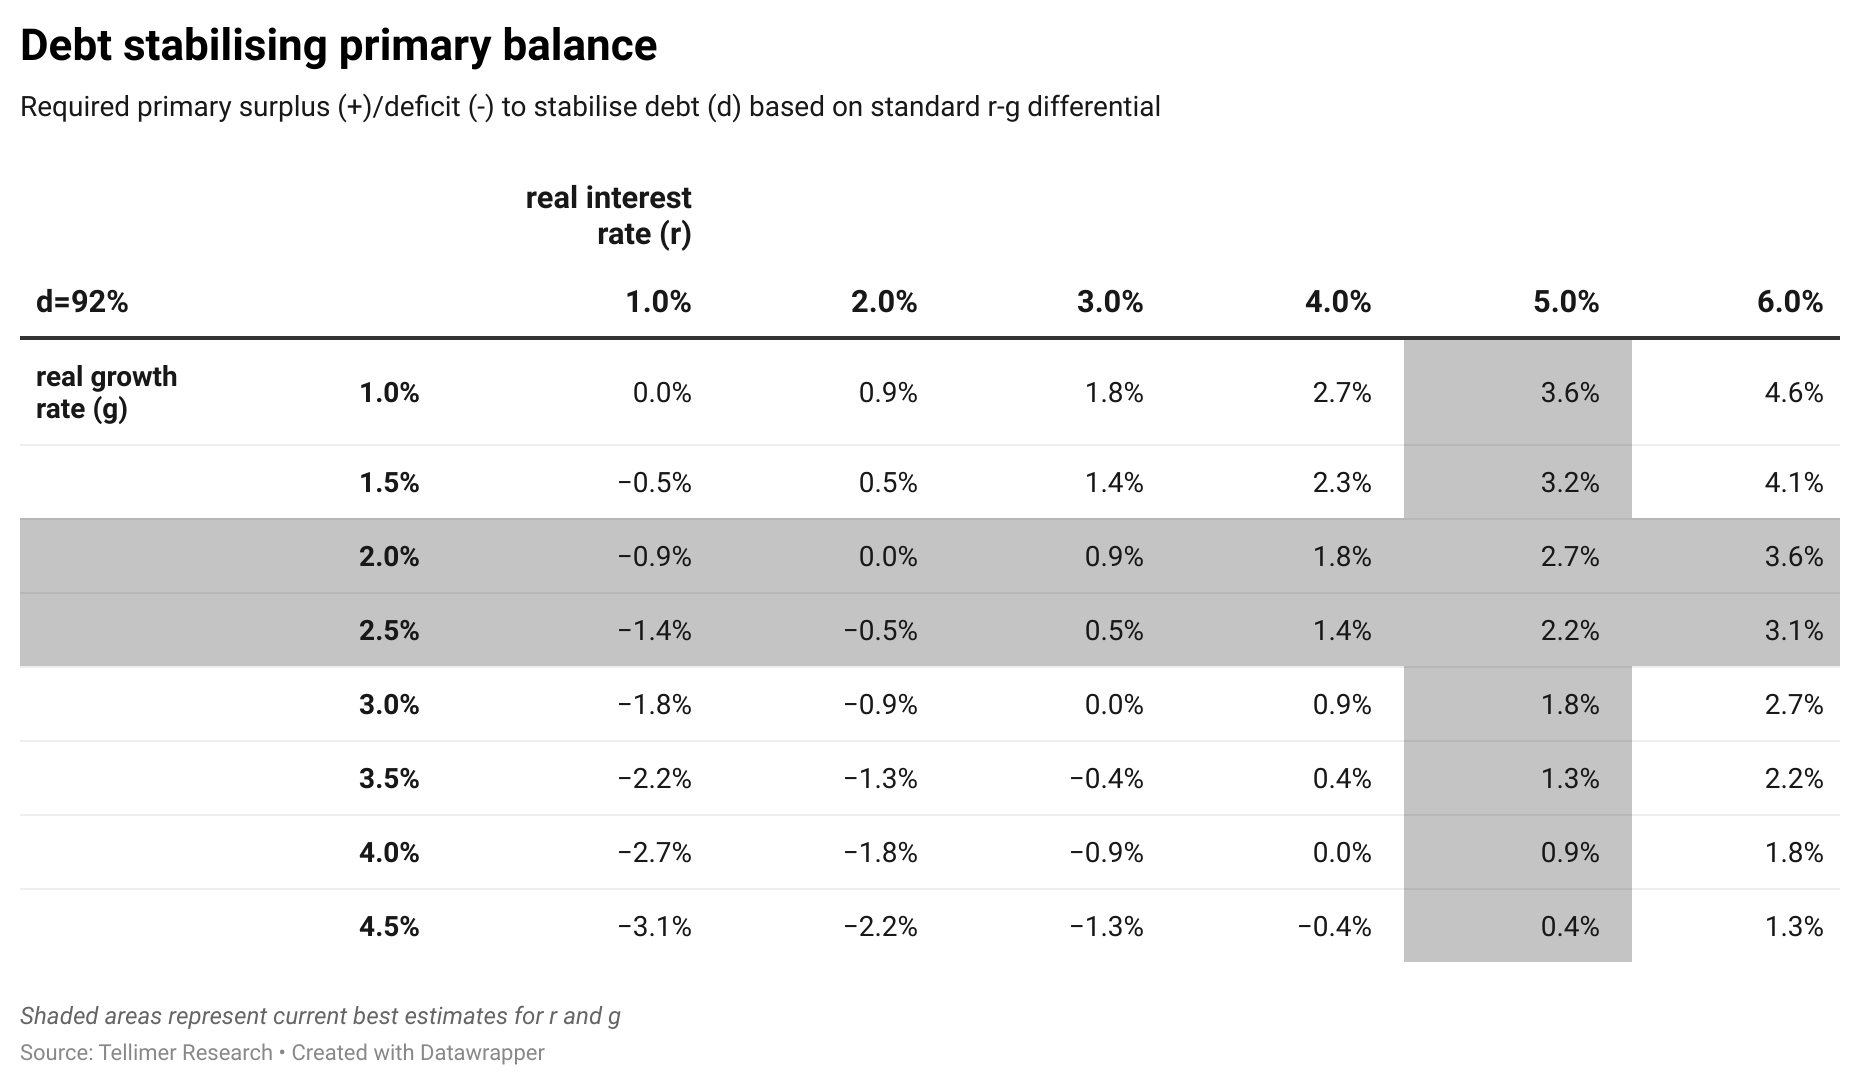 Debt stabilising primary balance